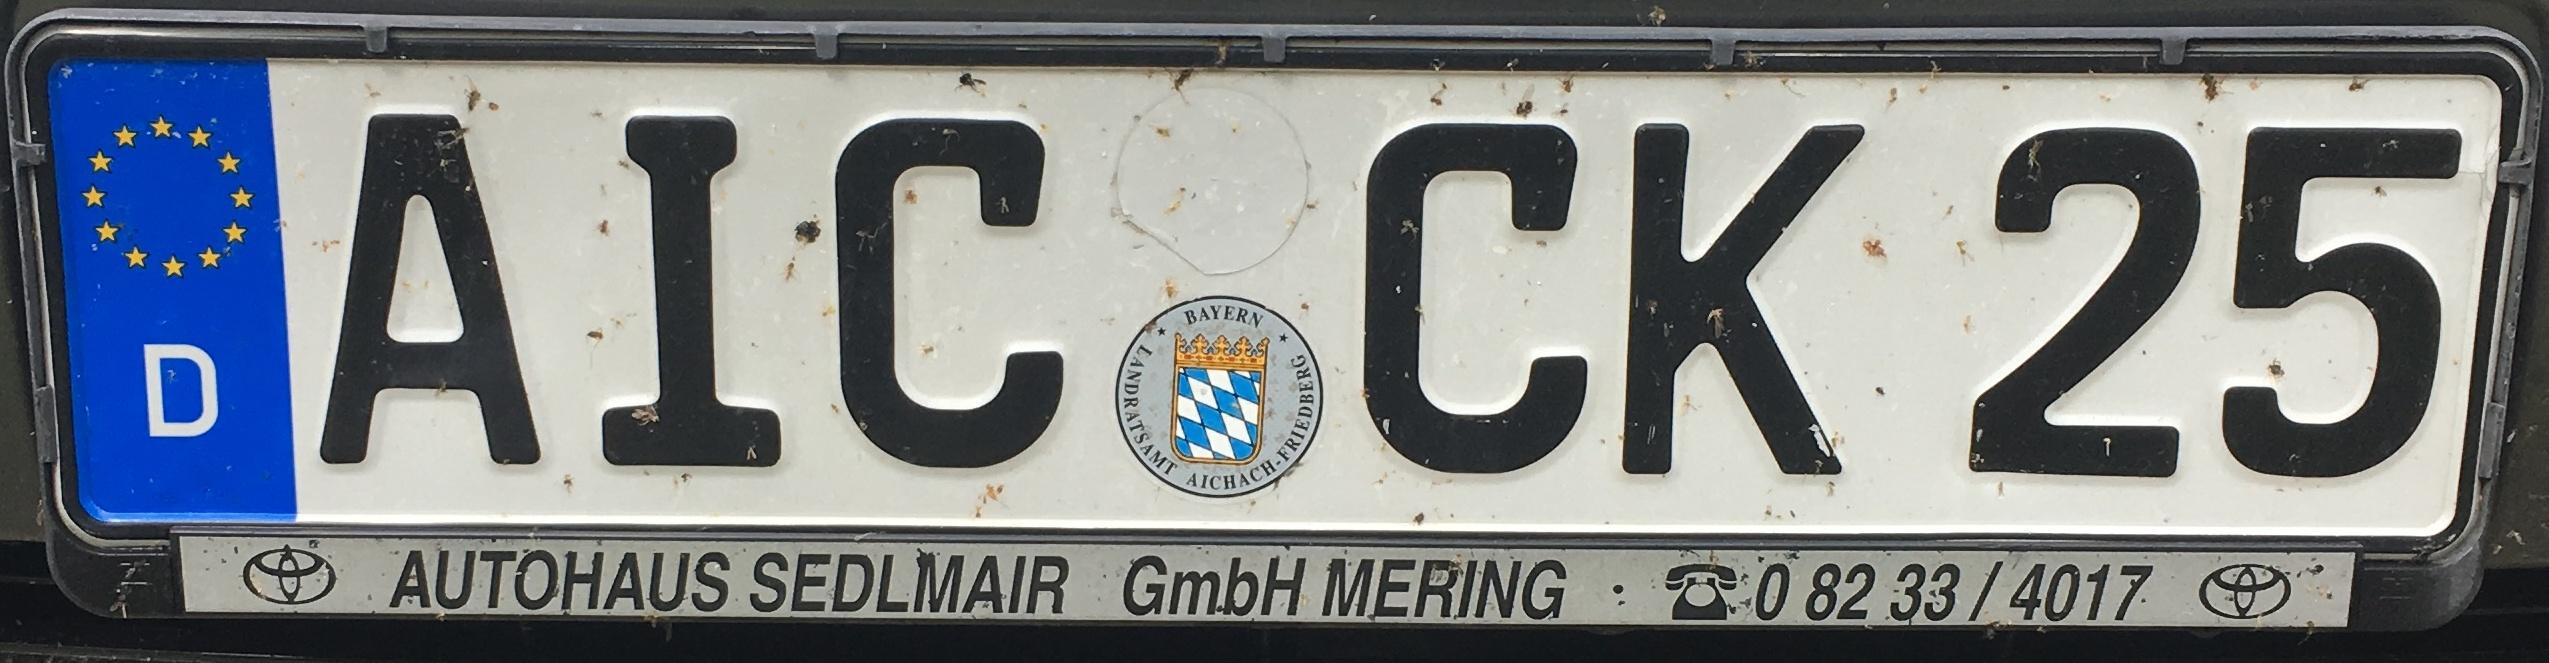 Registrační značka Německo - AIC - okres Aichach-Freidberg, foto: www.podalnici.cz